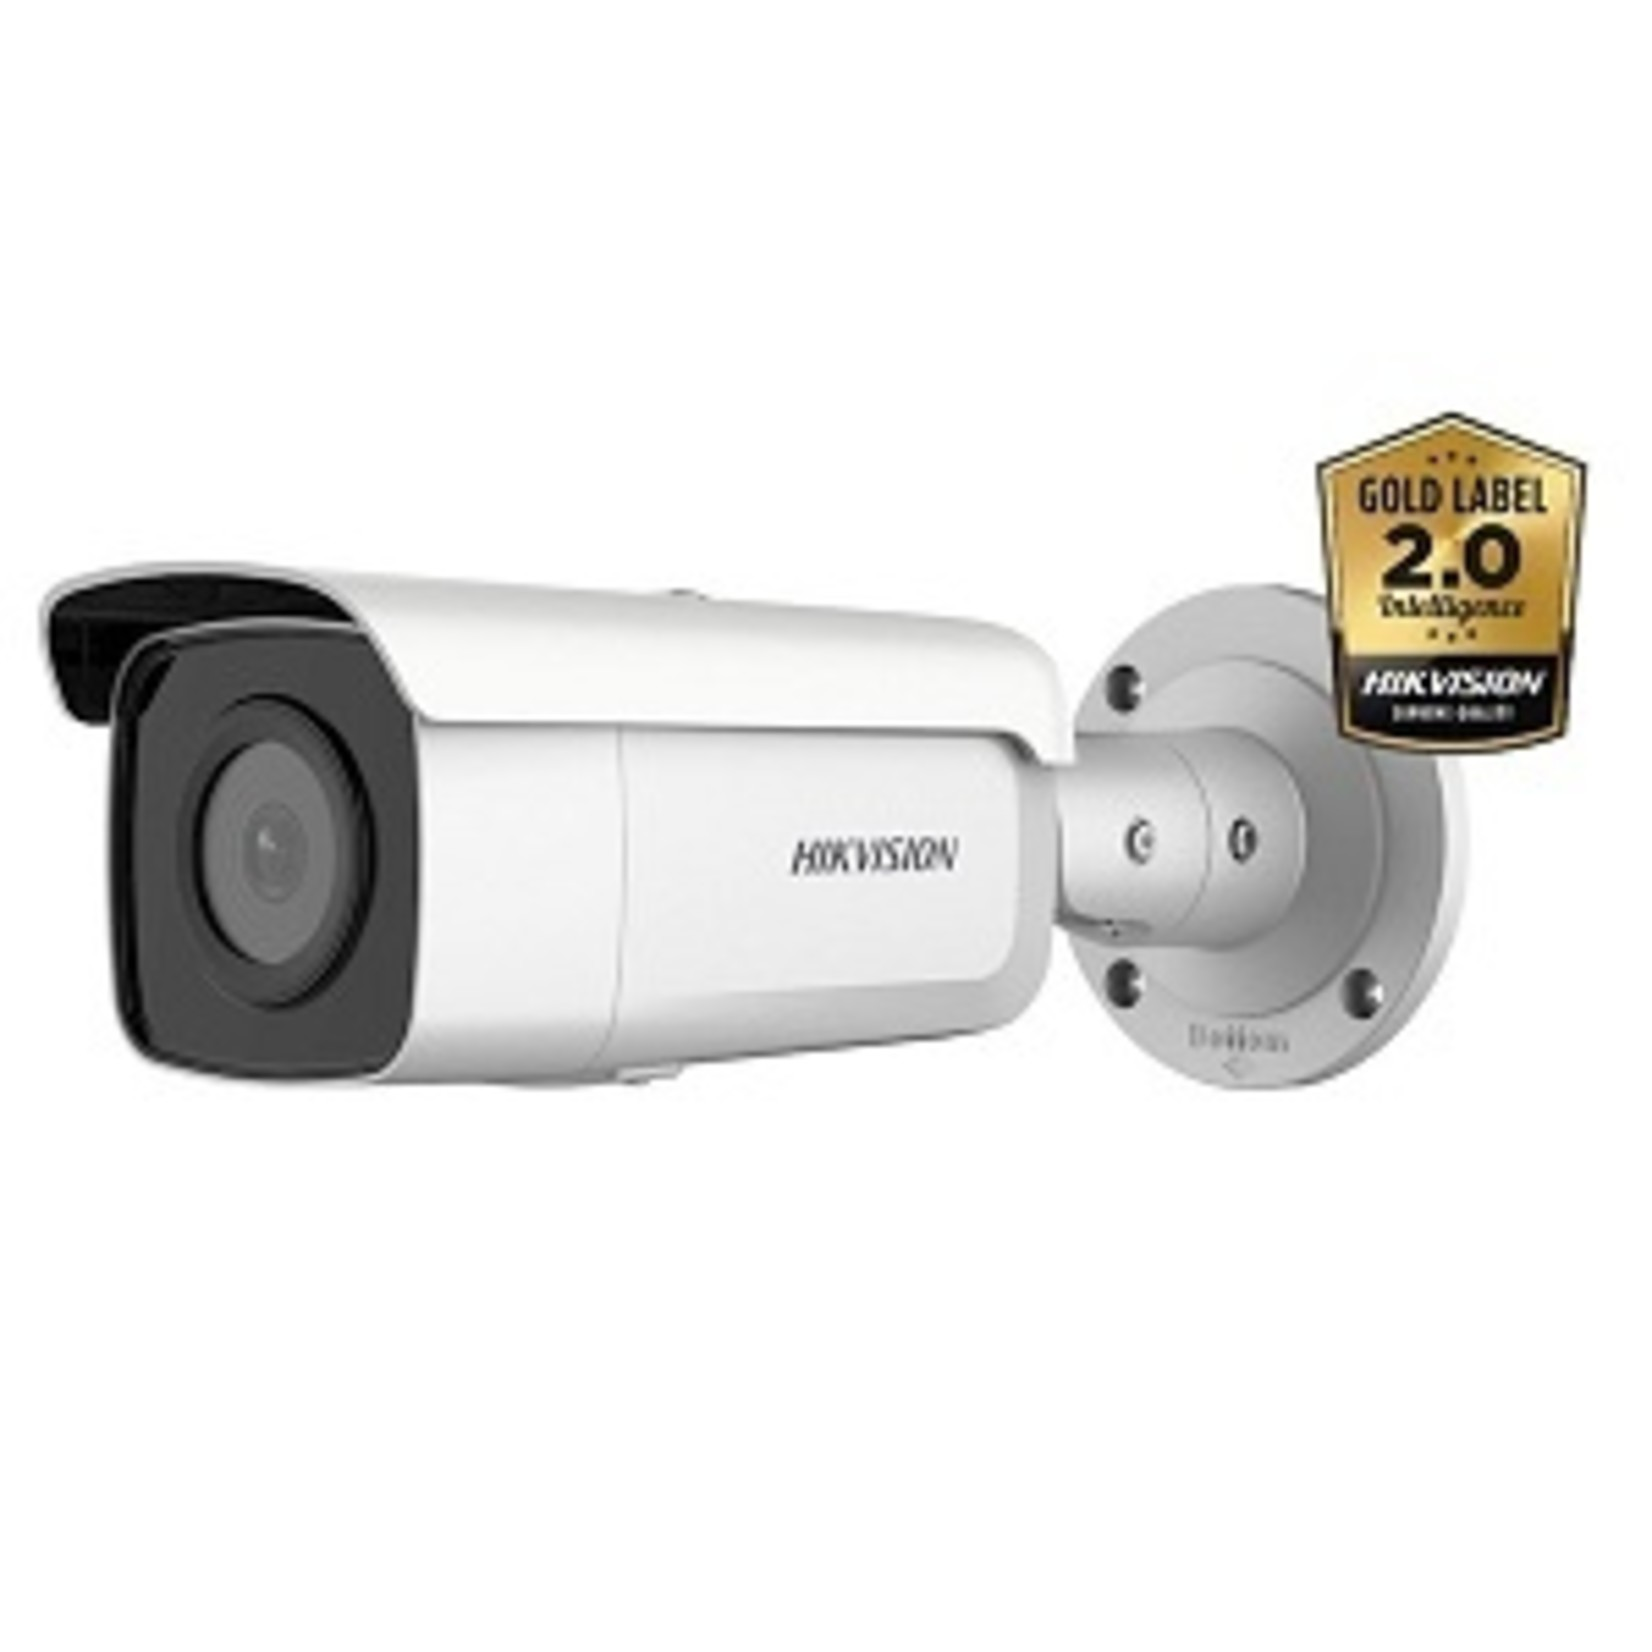 Hikvision DS-2CD2T86G2-4I, 8MP, 80m IR, WDR, Ultra Low Light